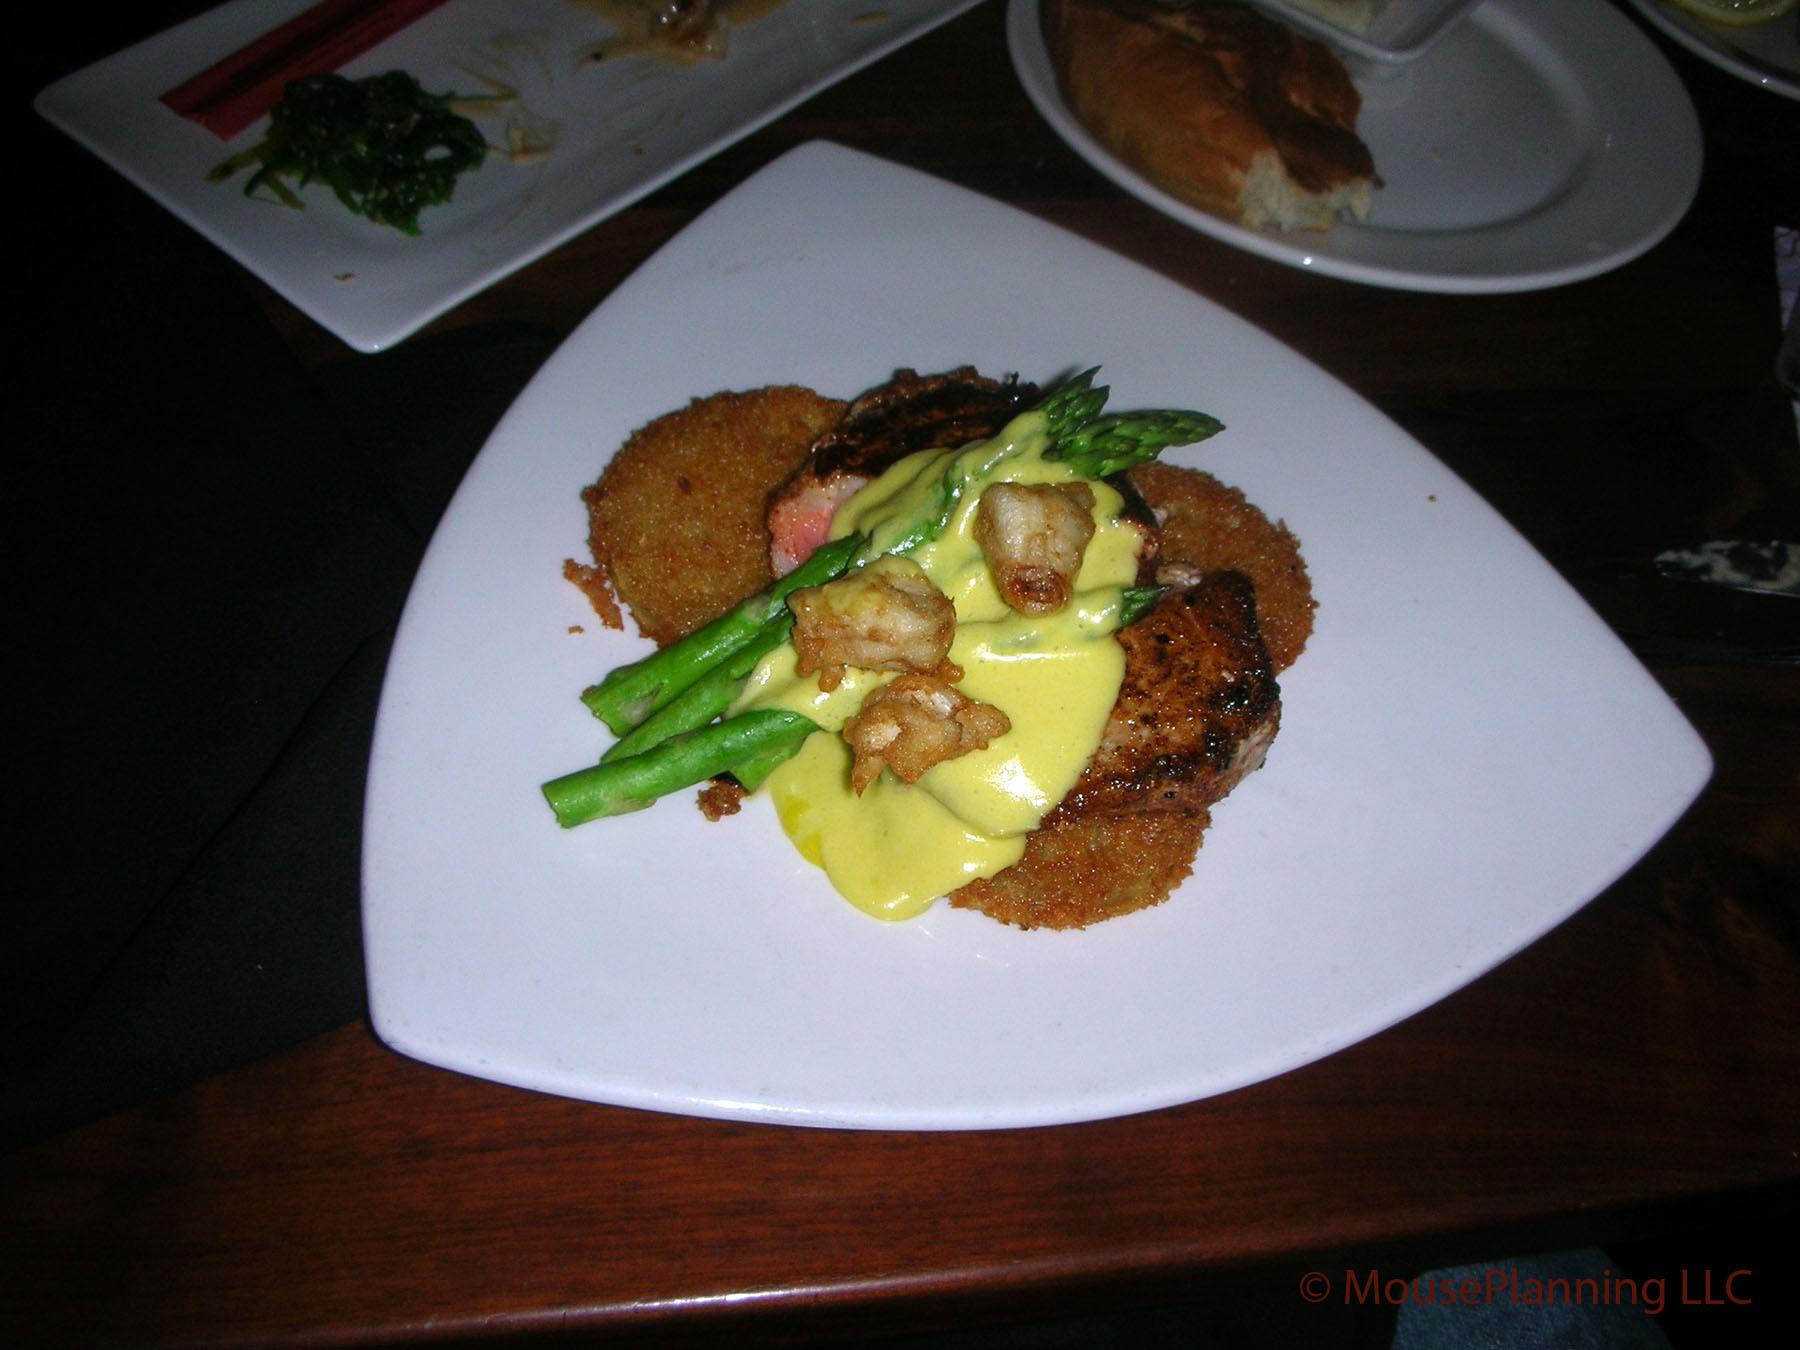 Kona Cafe Dinner - Tuna Oscar